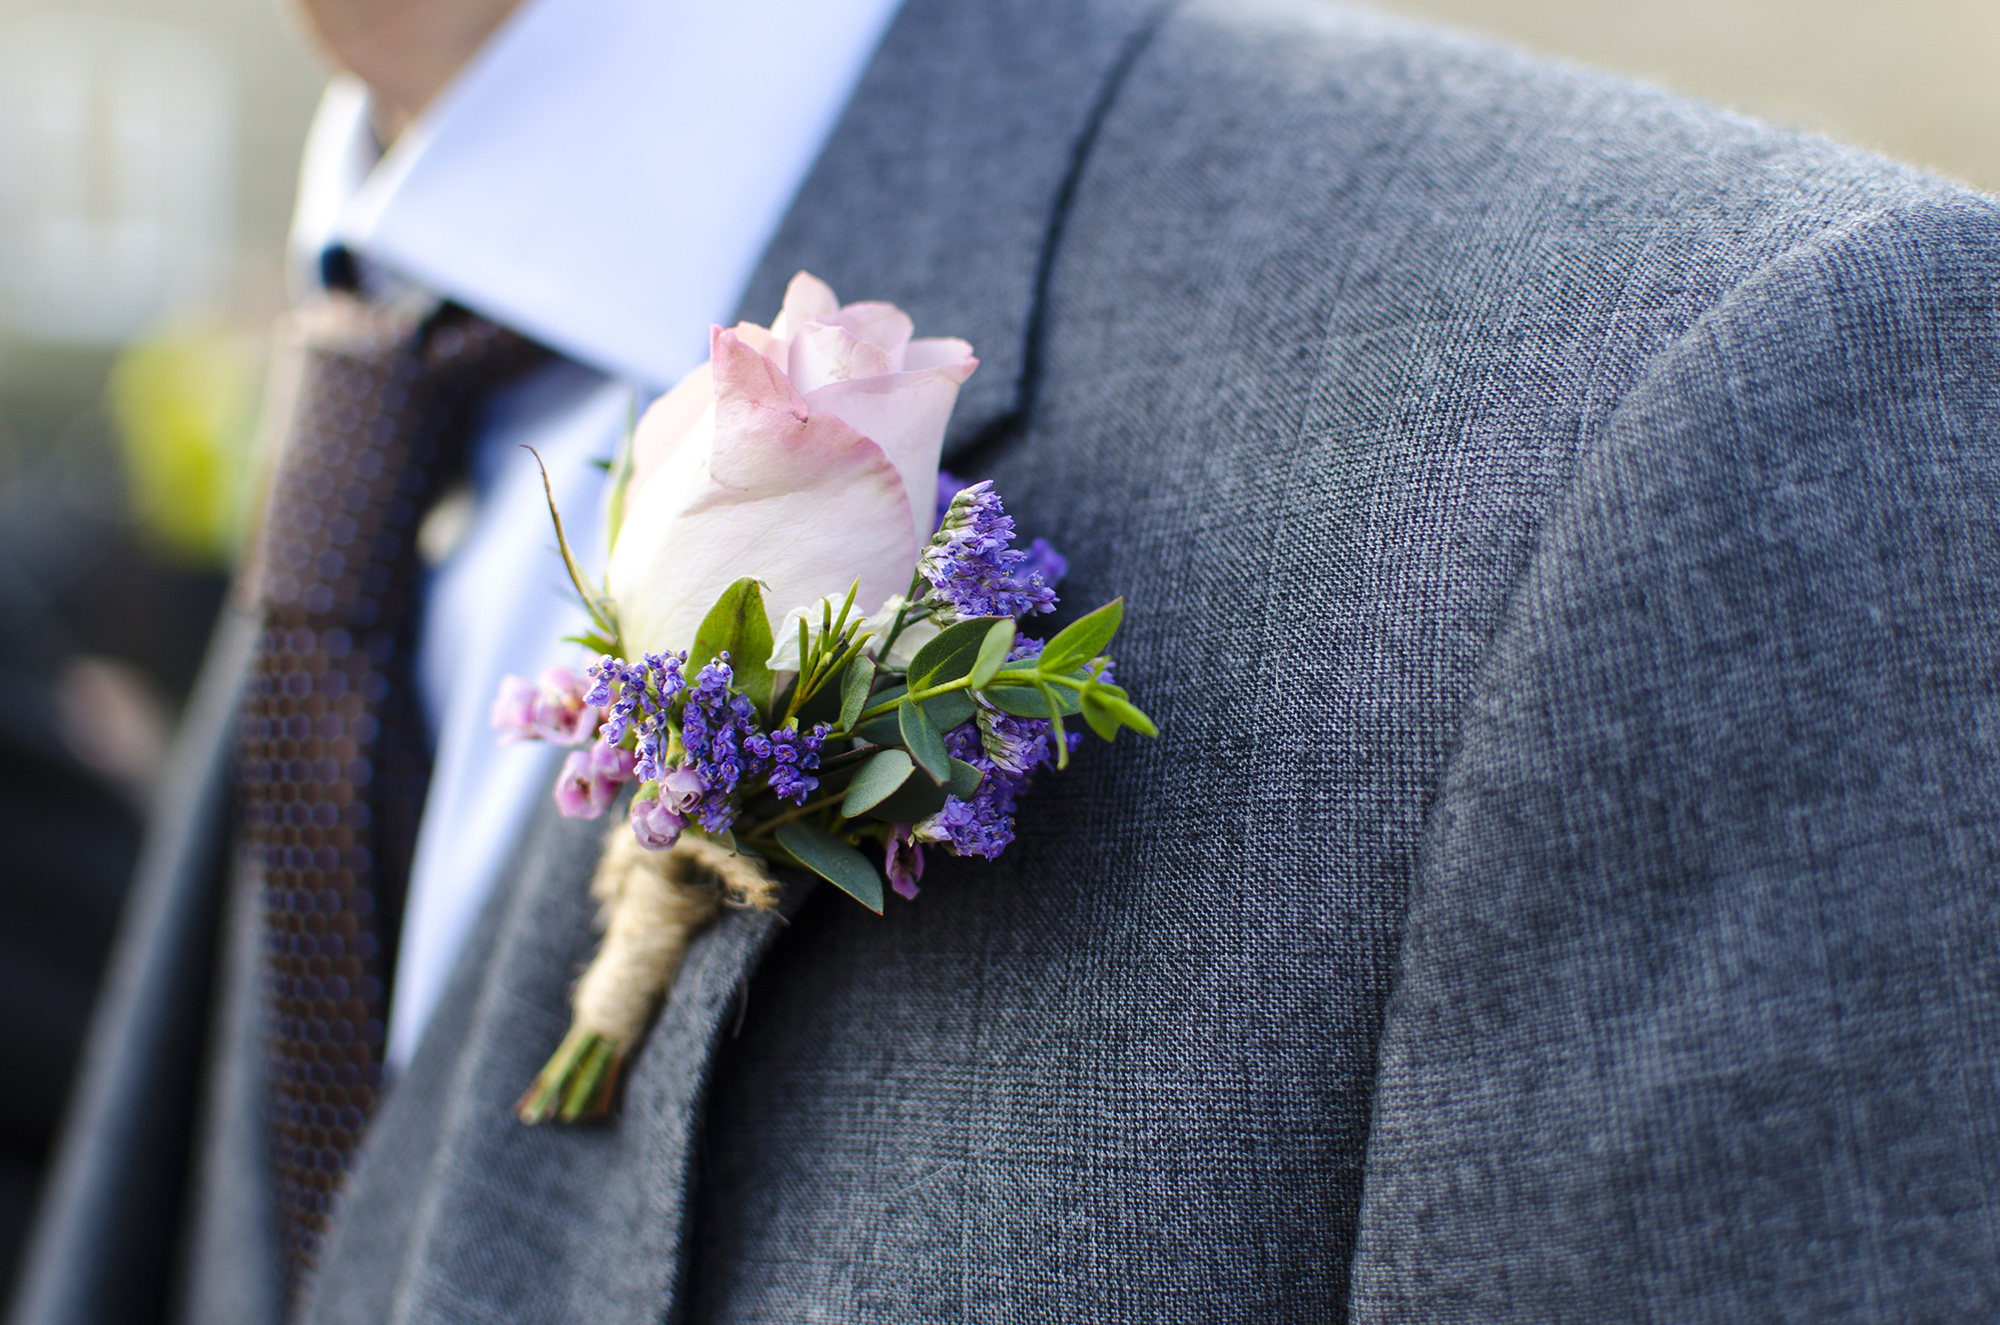 Peak_District_Bakewell_Wedding_021